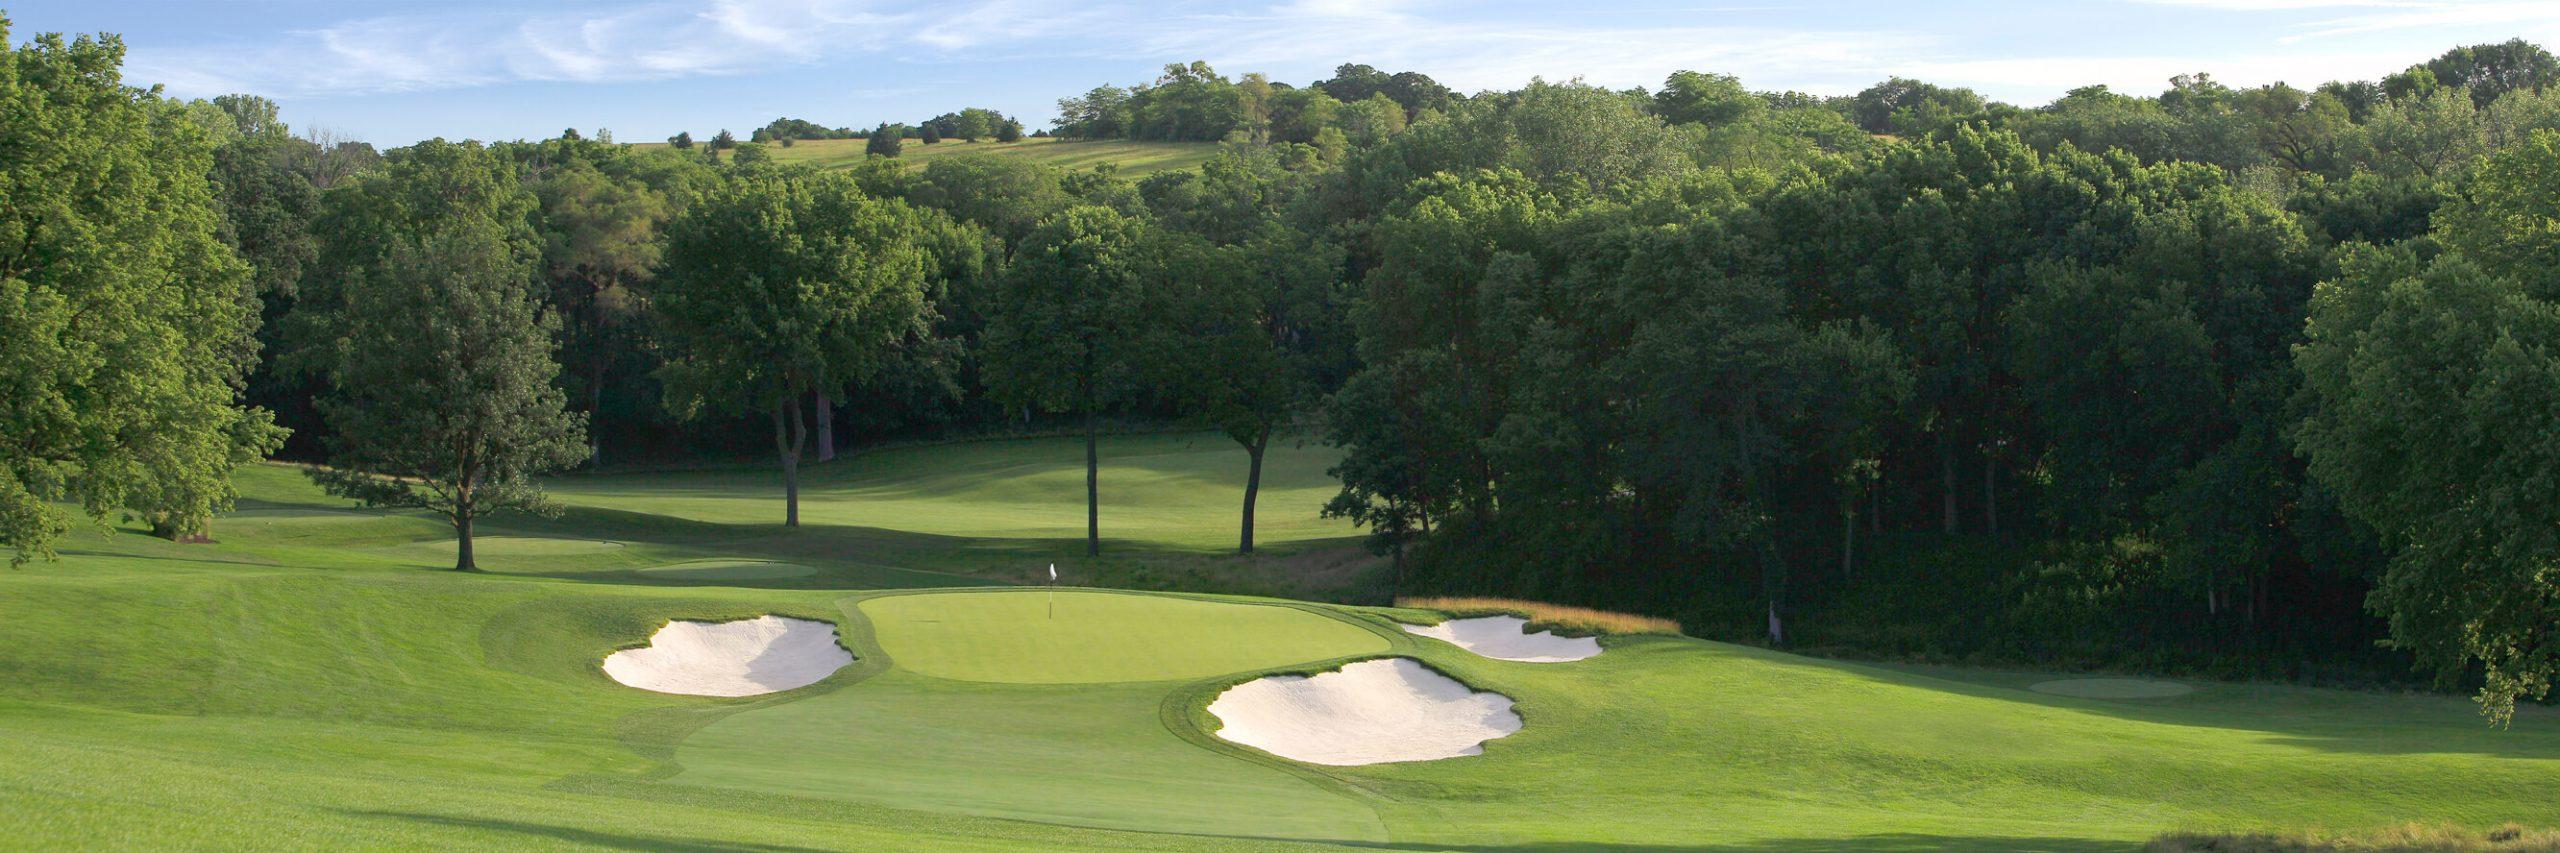 Golf Course Image - Omaha Country Club No. 15